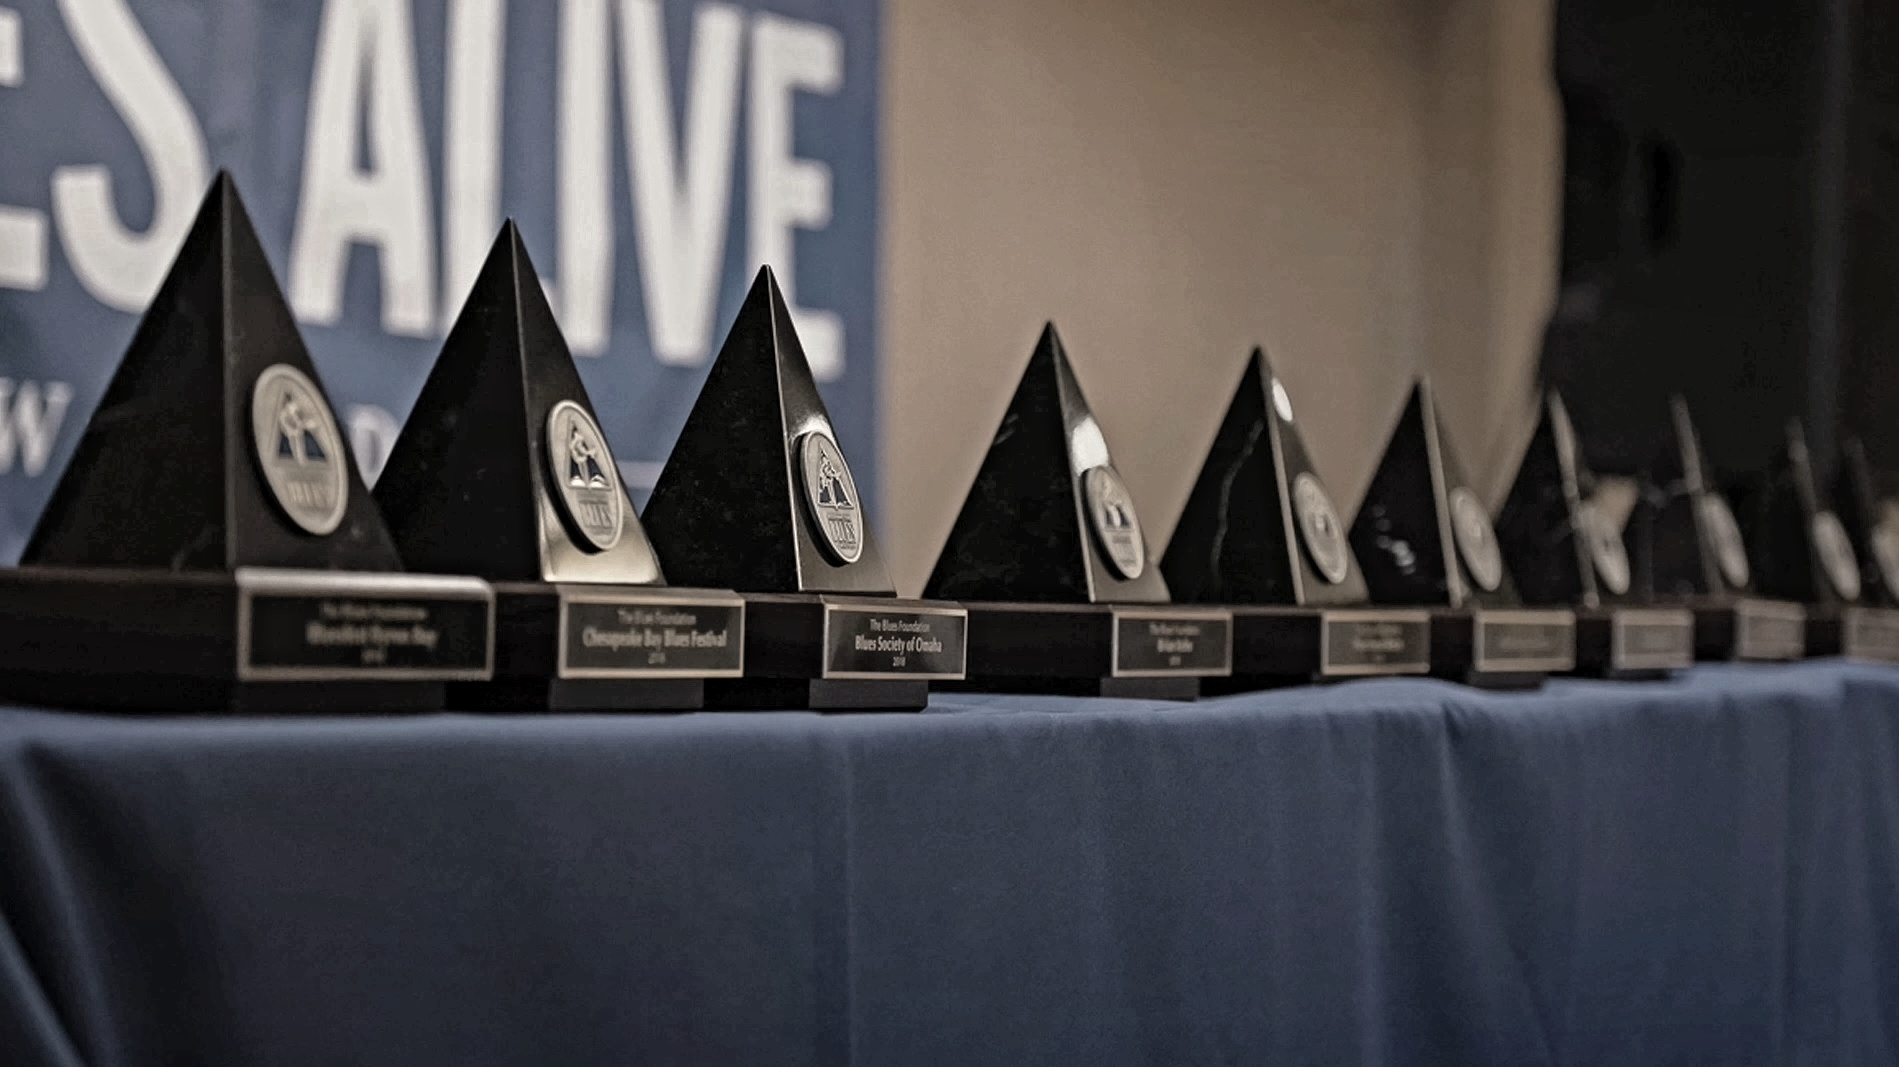 Keeping The Blues Alive Award zdroj foto: BA